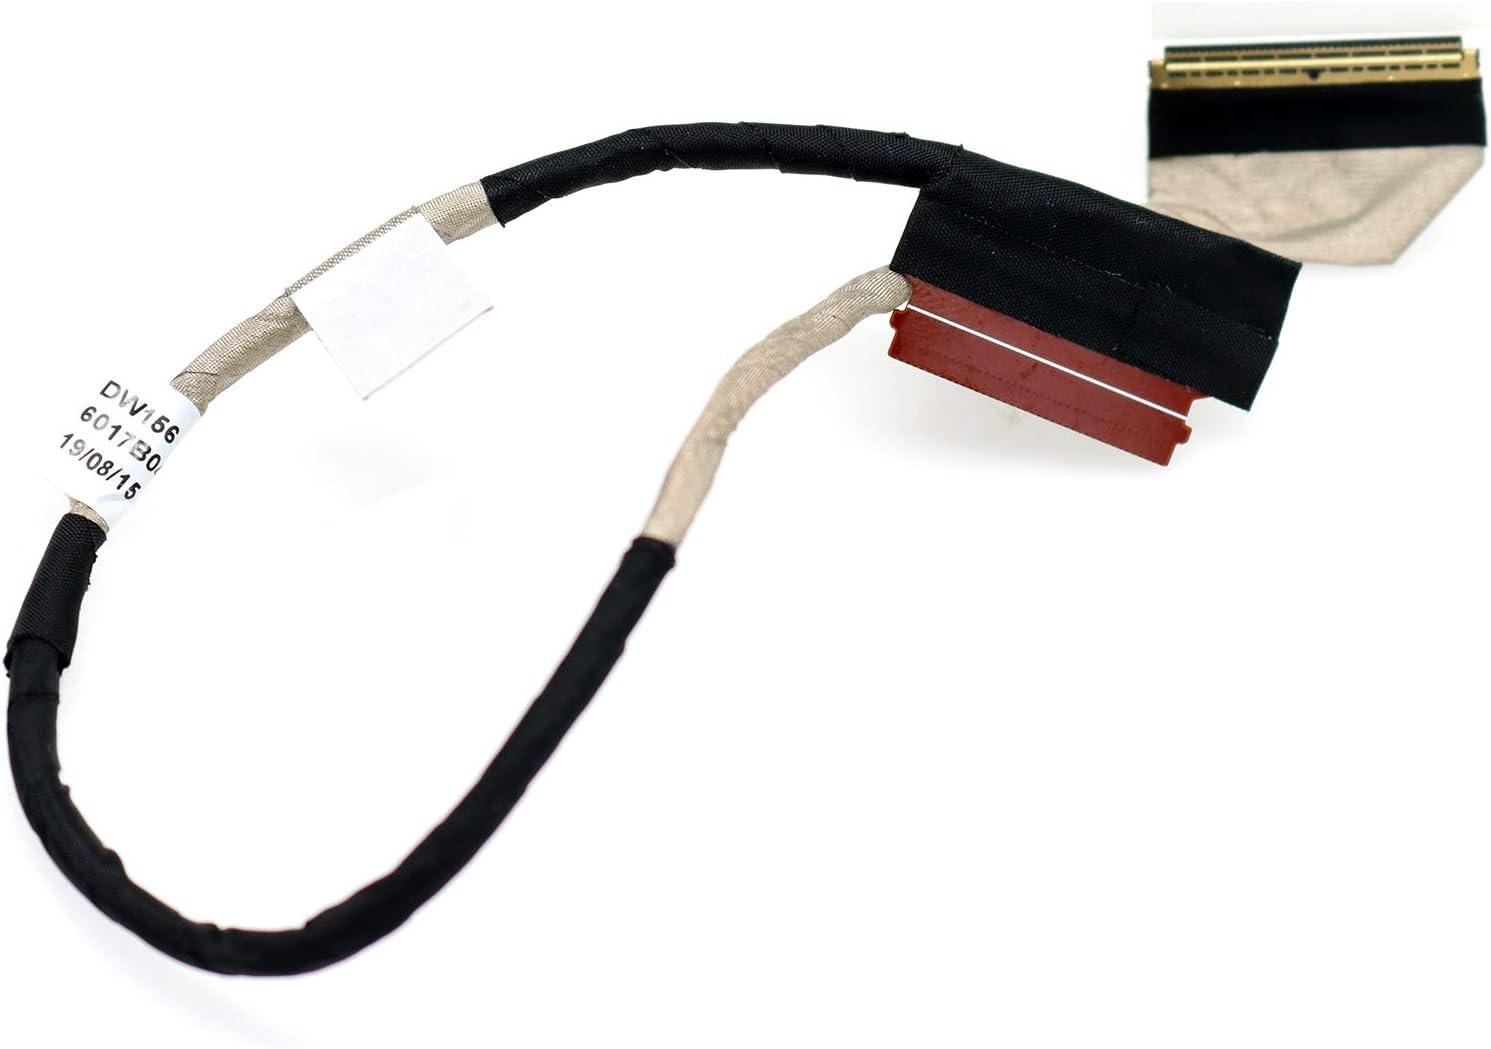 LCD LED LVDS VIDEO CABLE FOR HP 15-g137ds 15-g163nr 15-g166nr 15-g170nr